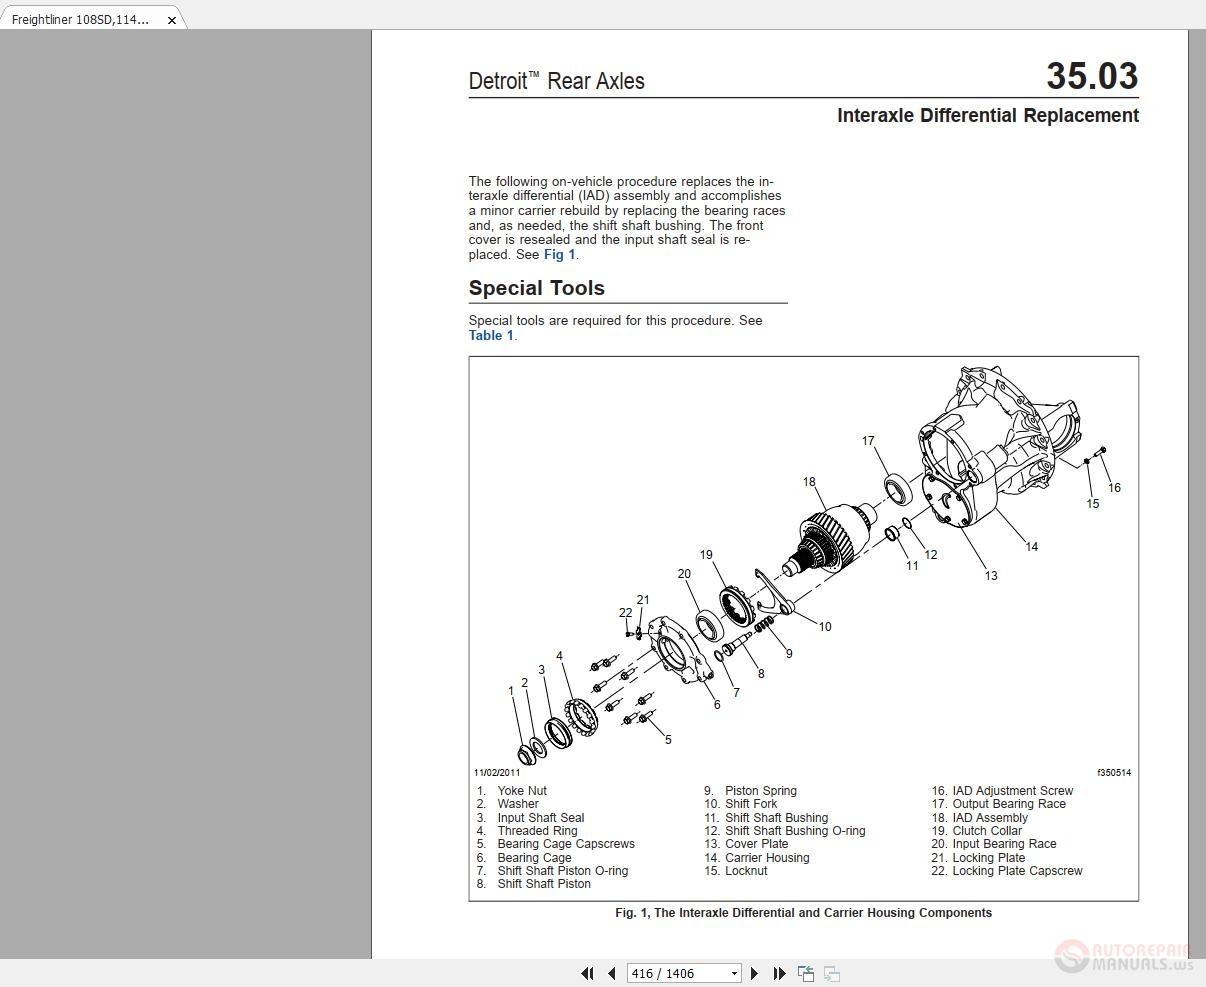 2011 Freightliner 114sd Wiring Diagram    Wiring Diagram